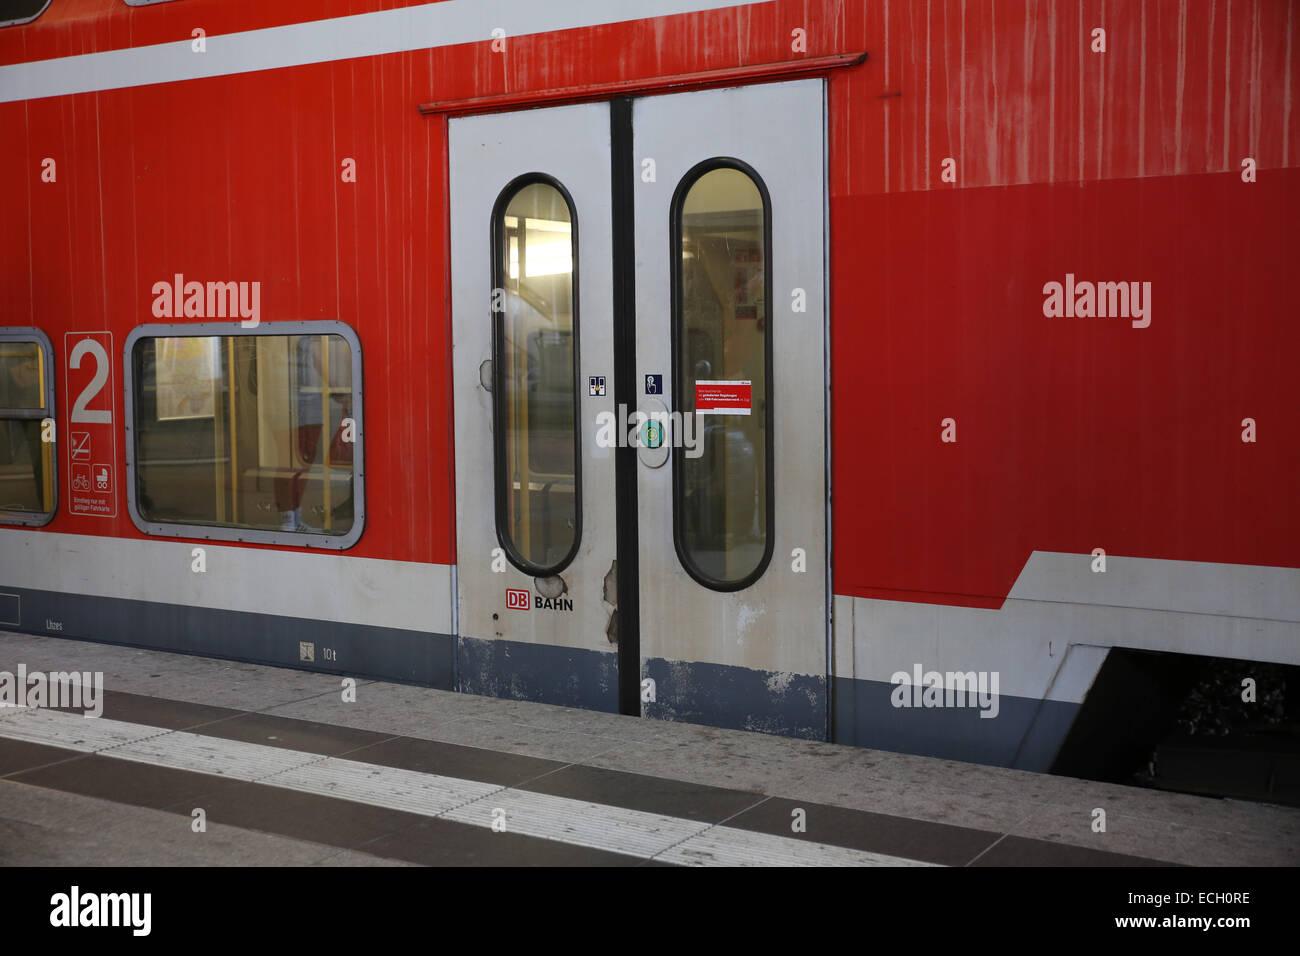 train door close db bahn german railway - Stock Image & Train Door Stock Photos \u0026 Train Door Stock Images - Alamy